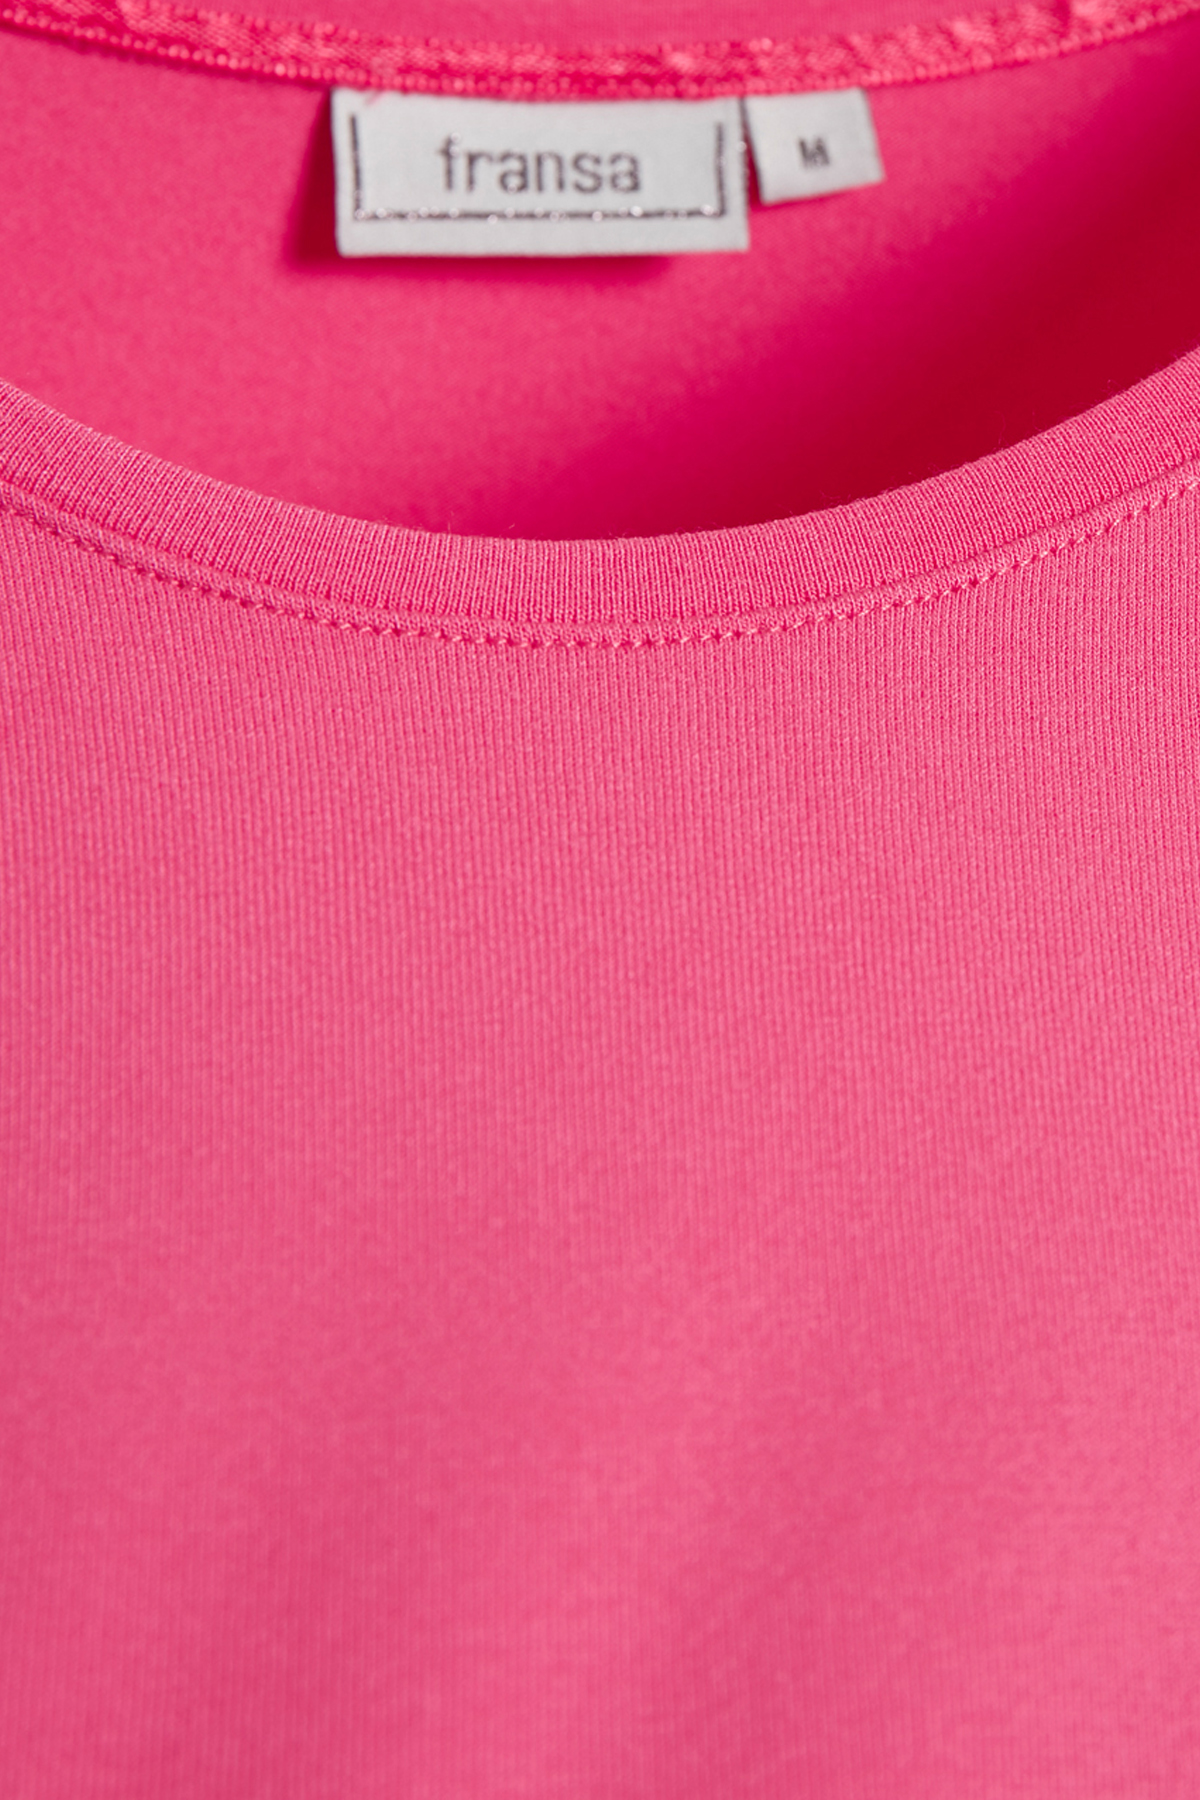 Pink Langarm T-Shirt von Fransa – Shoppen Sie Pink Langarm T-Shirt ab Gr. XS-XXL hier